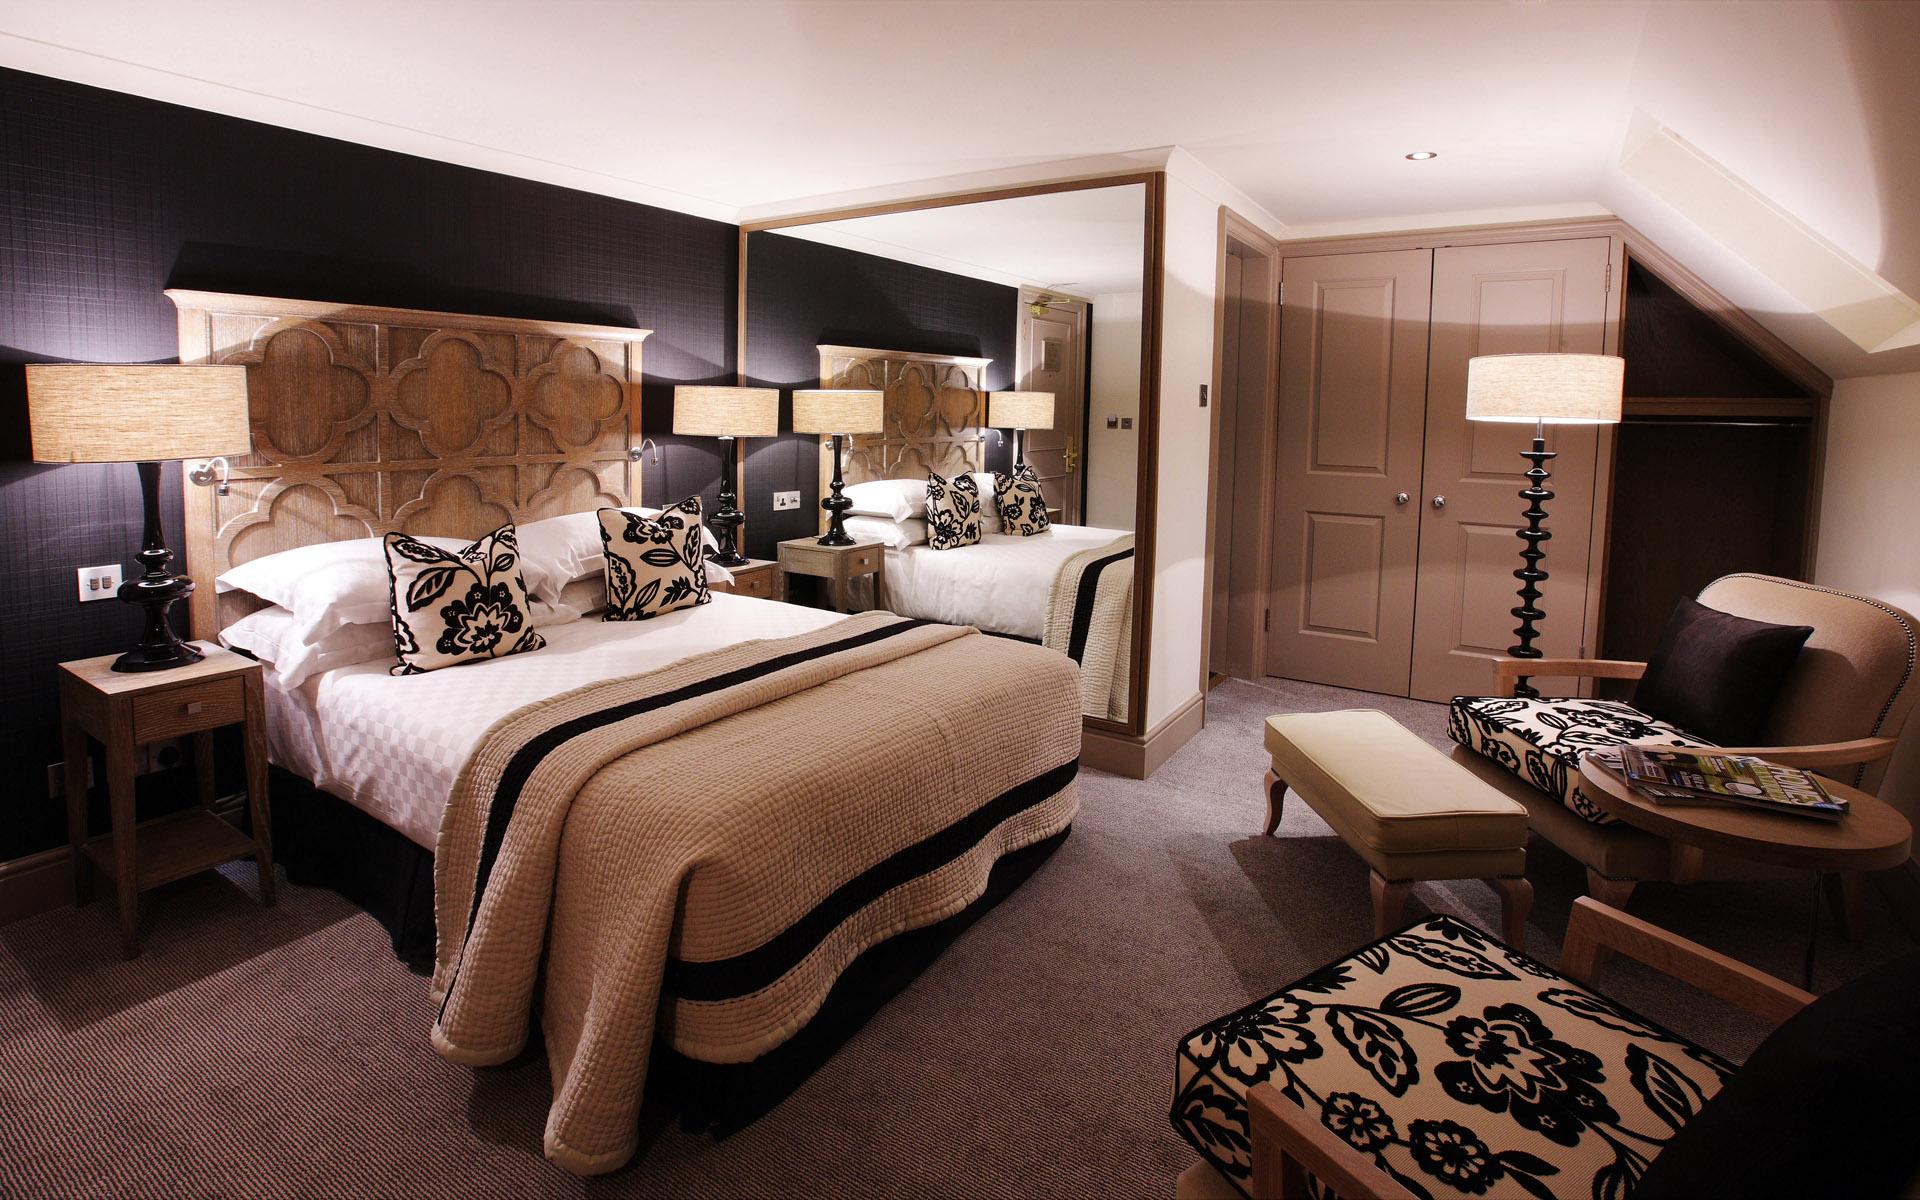 Дизайн спальня картинки